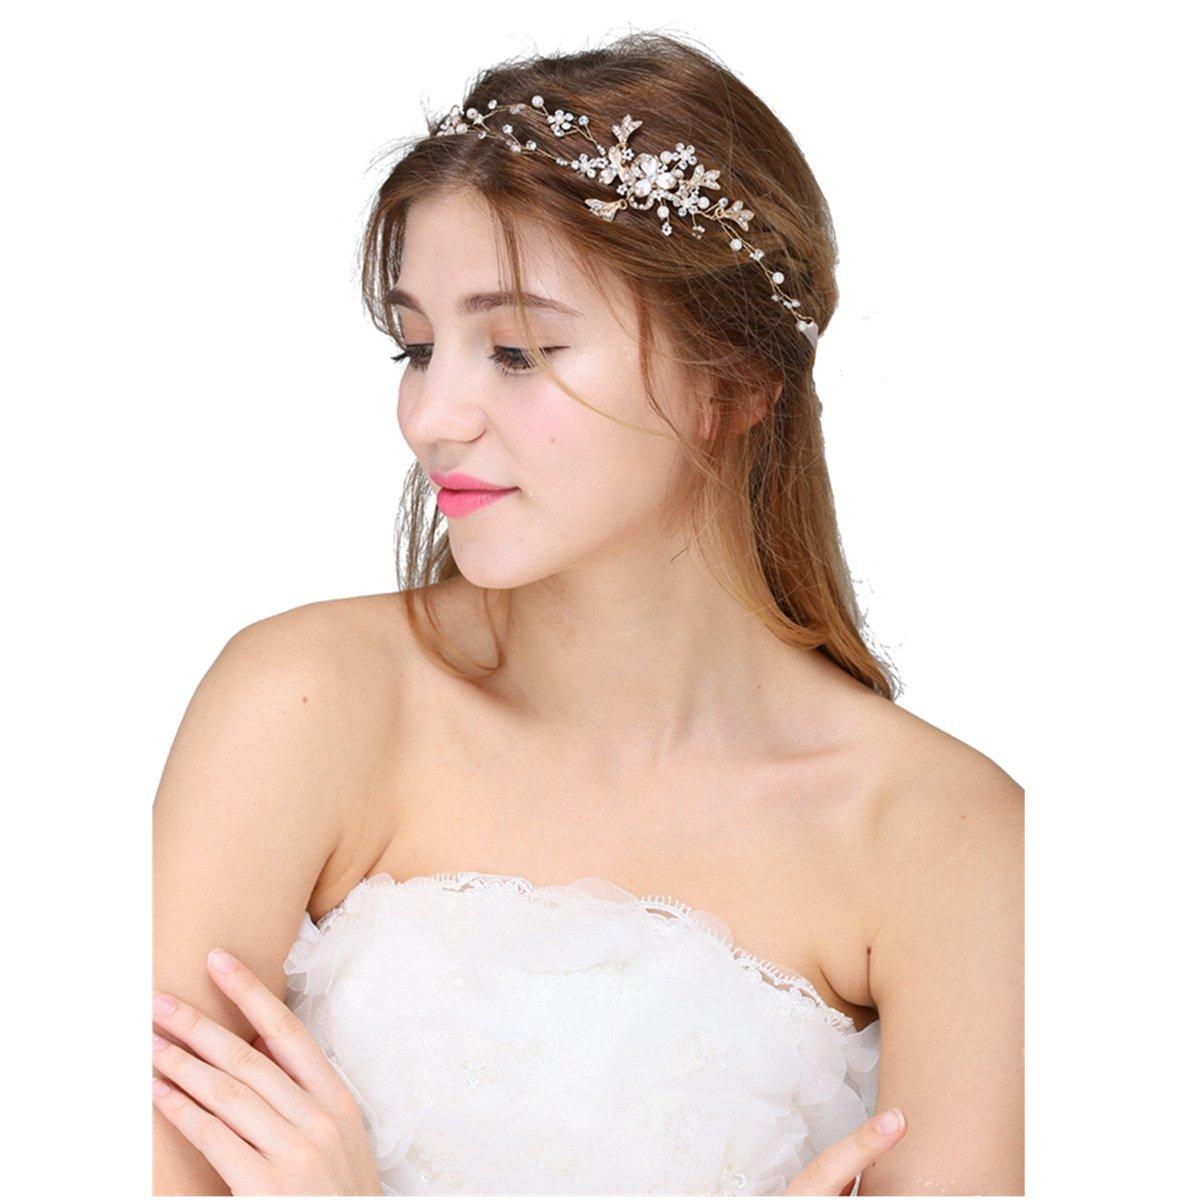 Hopefultech Strass perla capelli sposa bande pettine da sposa accessori per  capelli da sposa fascia fermacapelli perline strass Perline con strass di  ... b75715fd772c